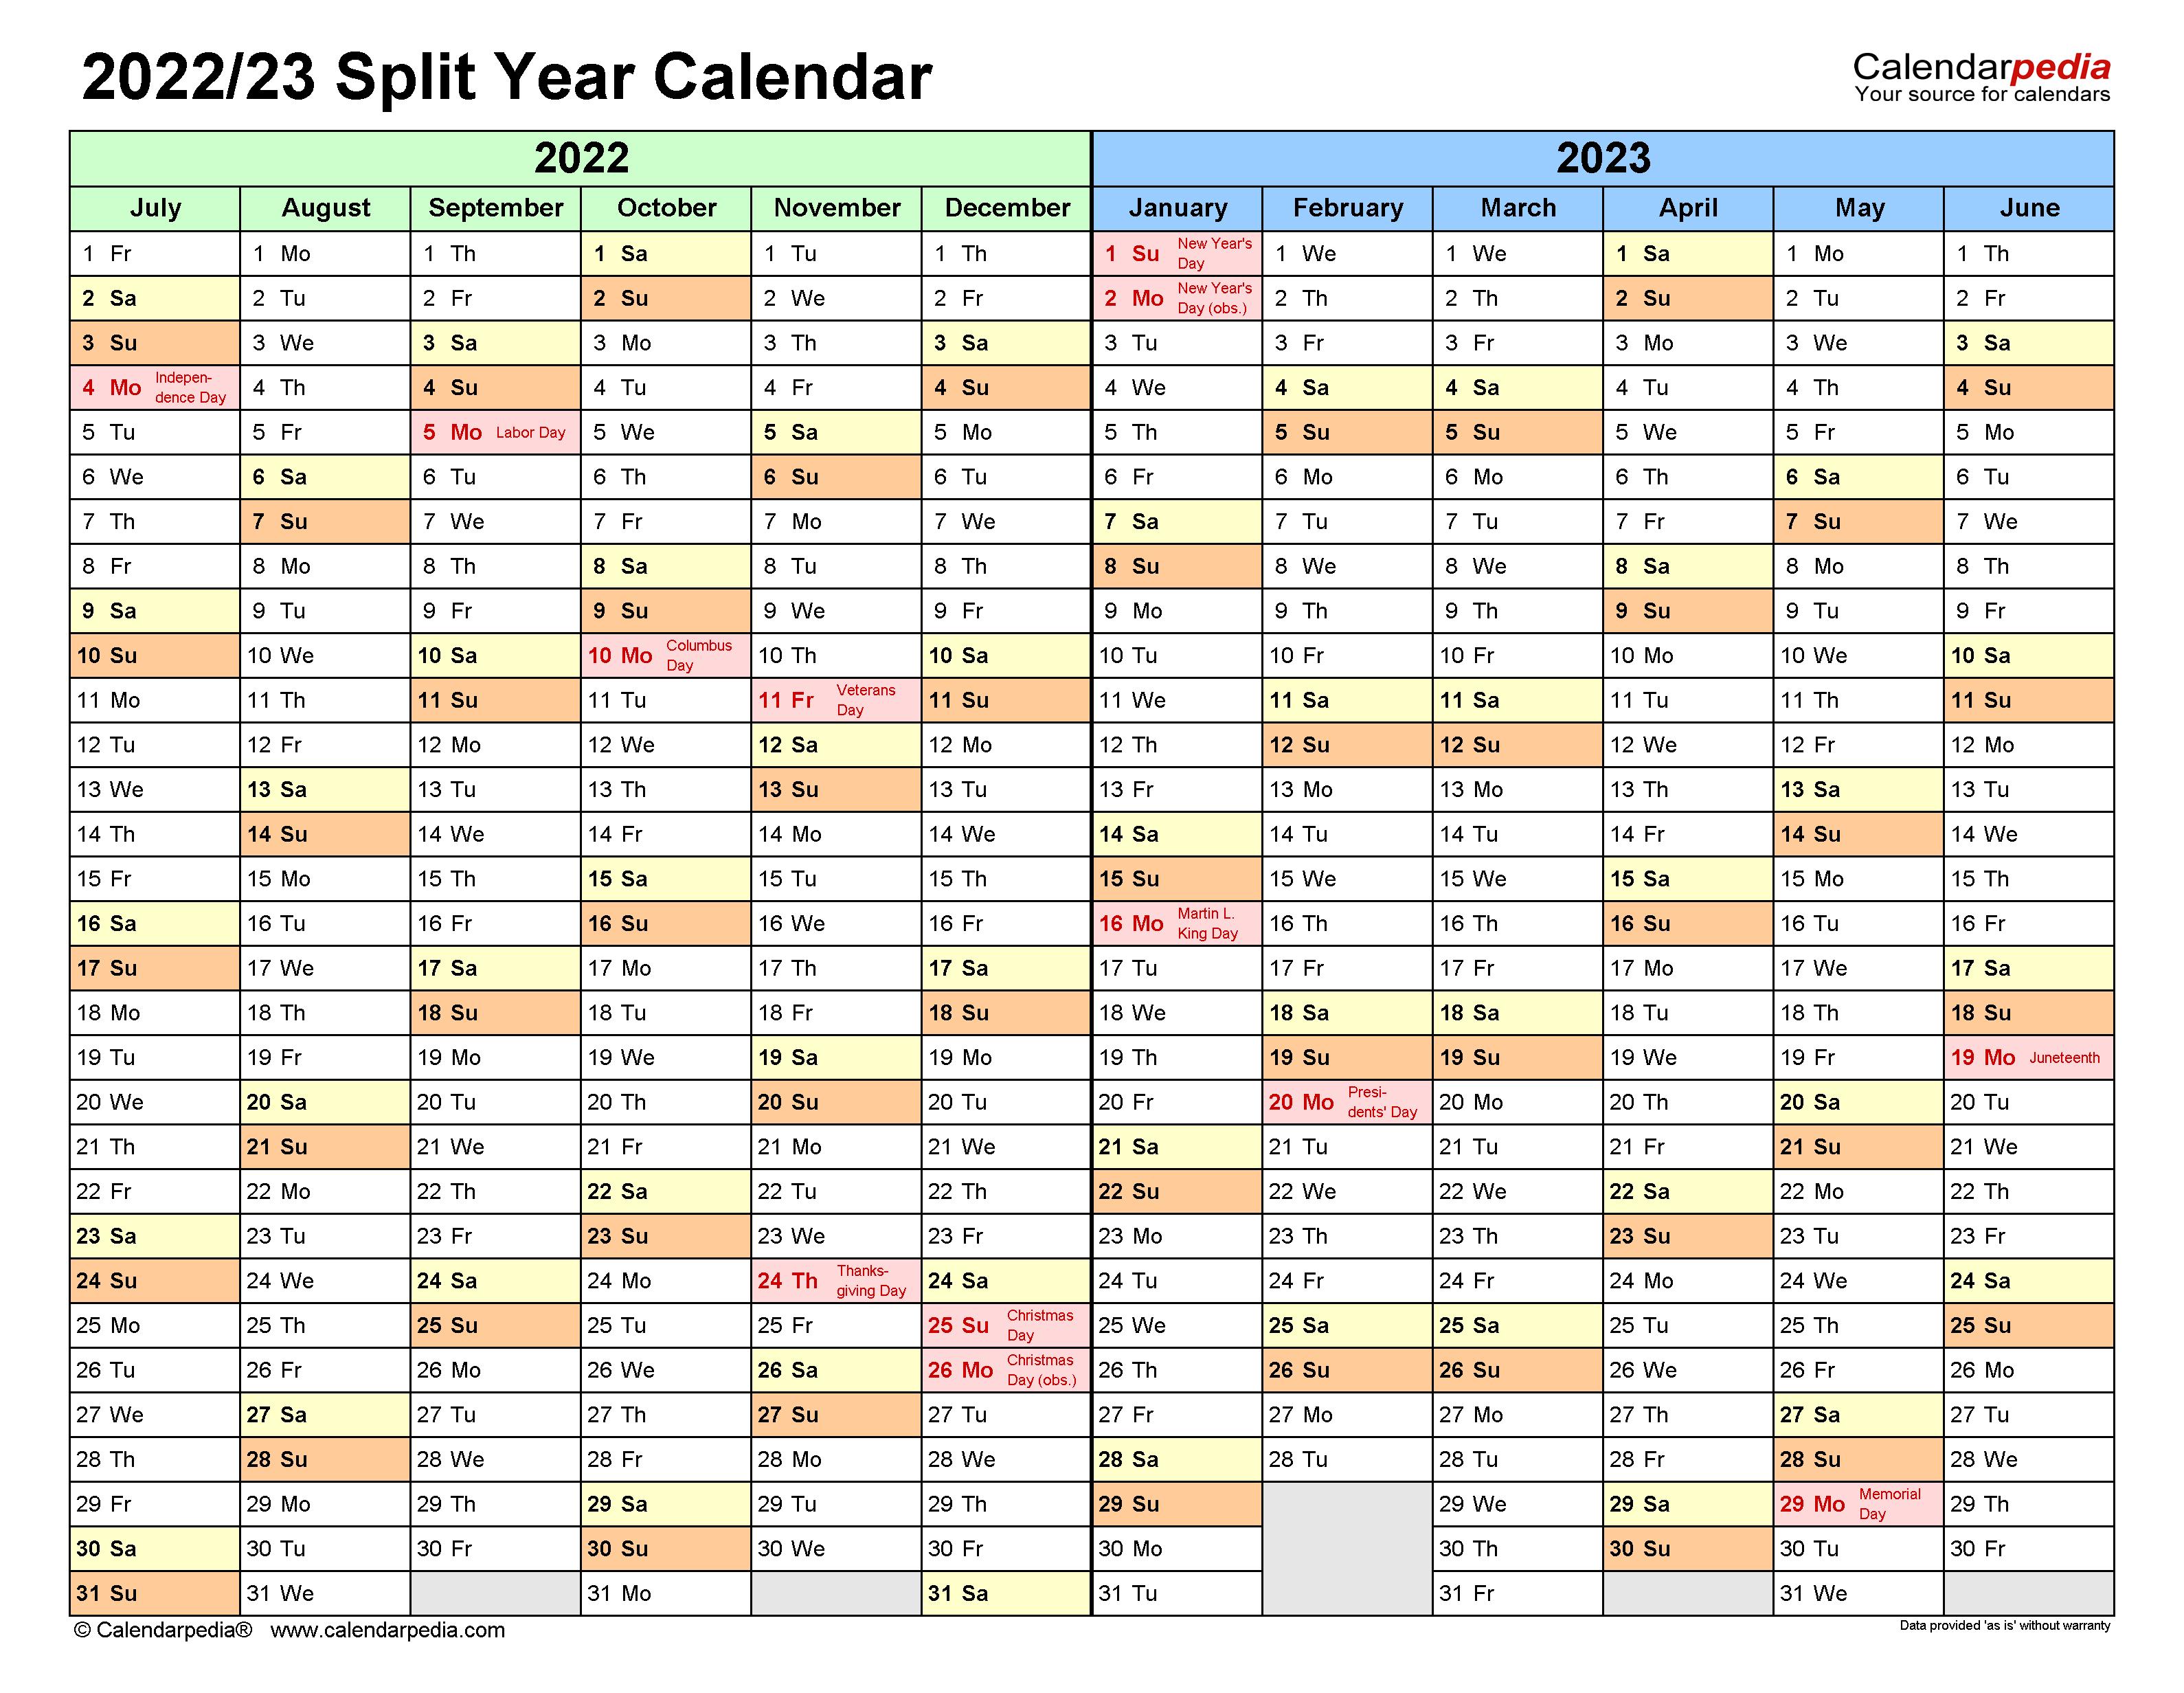 Uiuc Calendar 2022 23.Split Year Calendars 2022 2023 July To June Pdf Templates